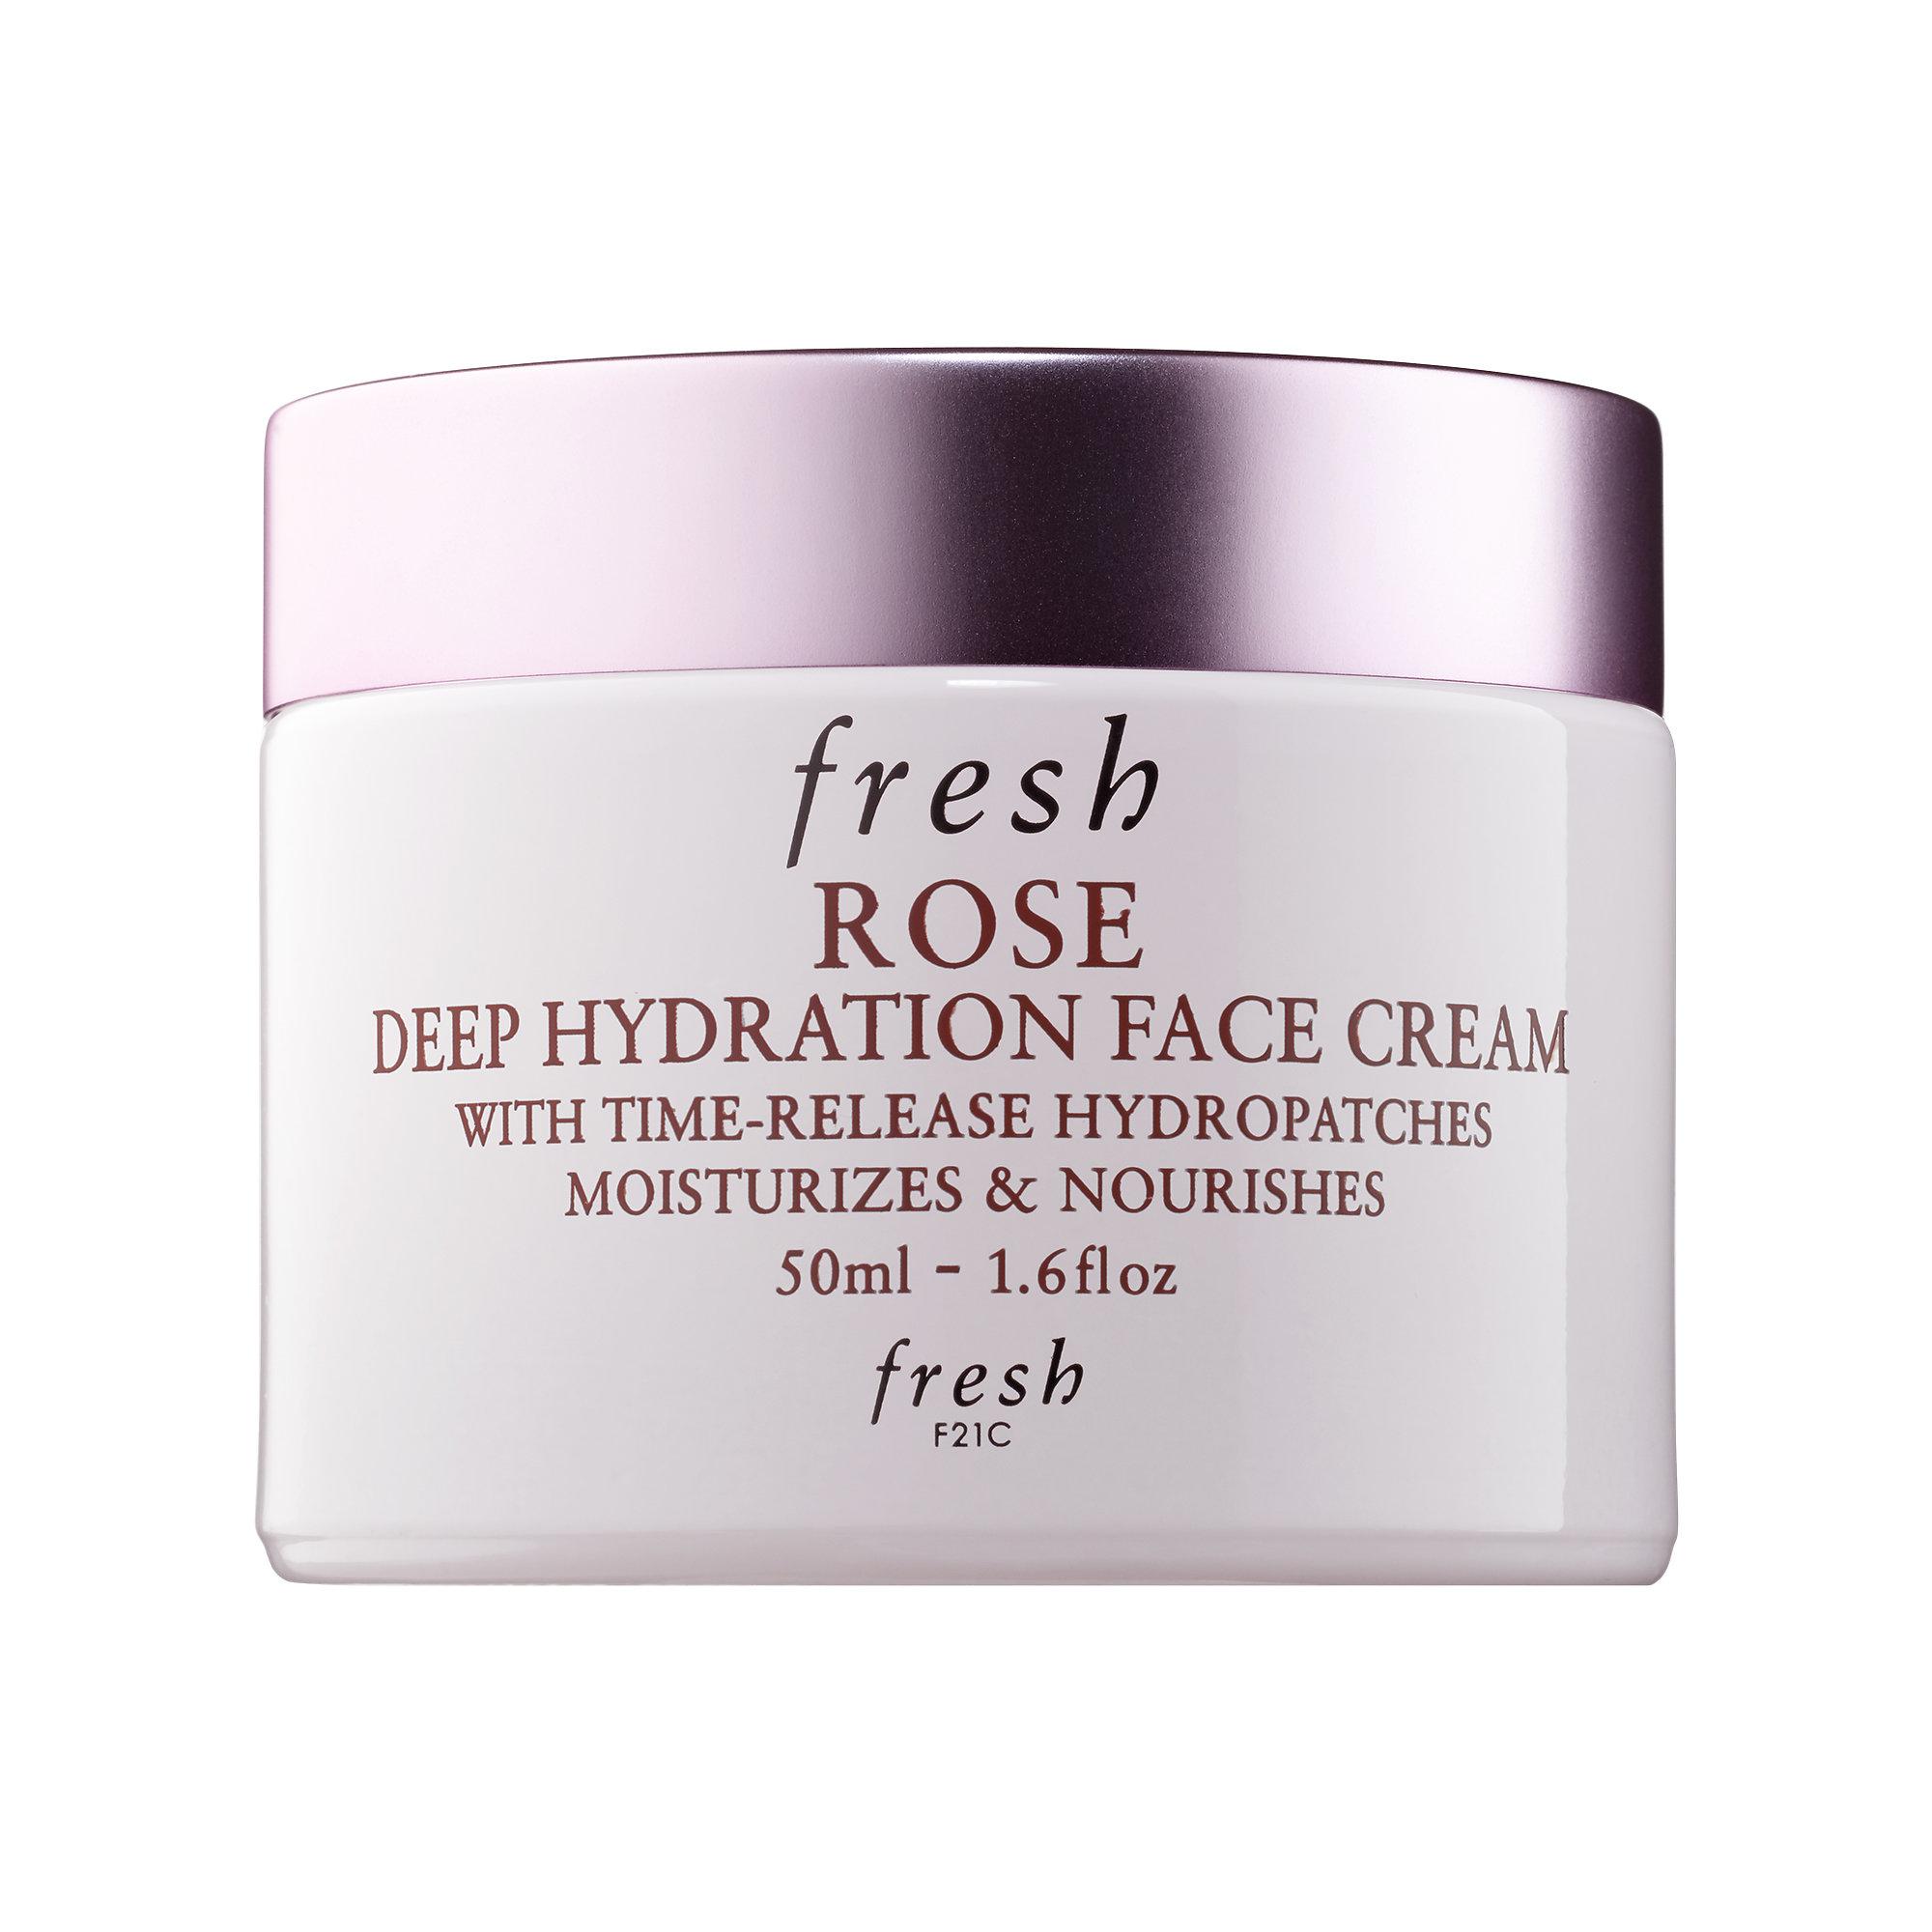 Fresh - Rose Deep Hydration Moisturizer